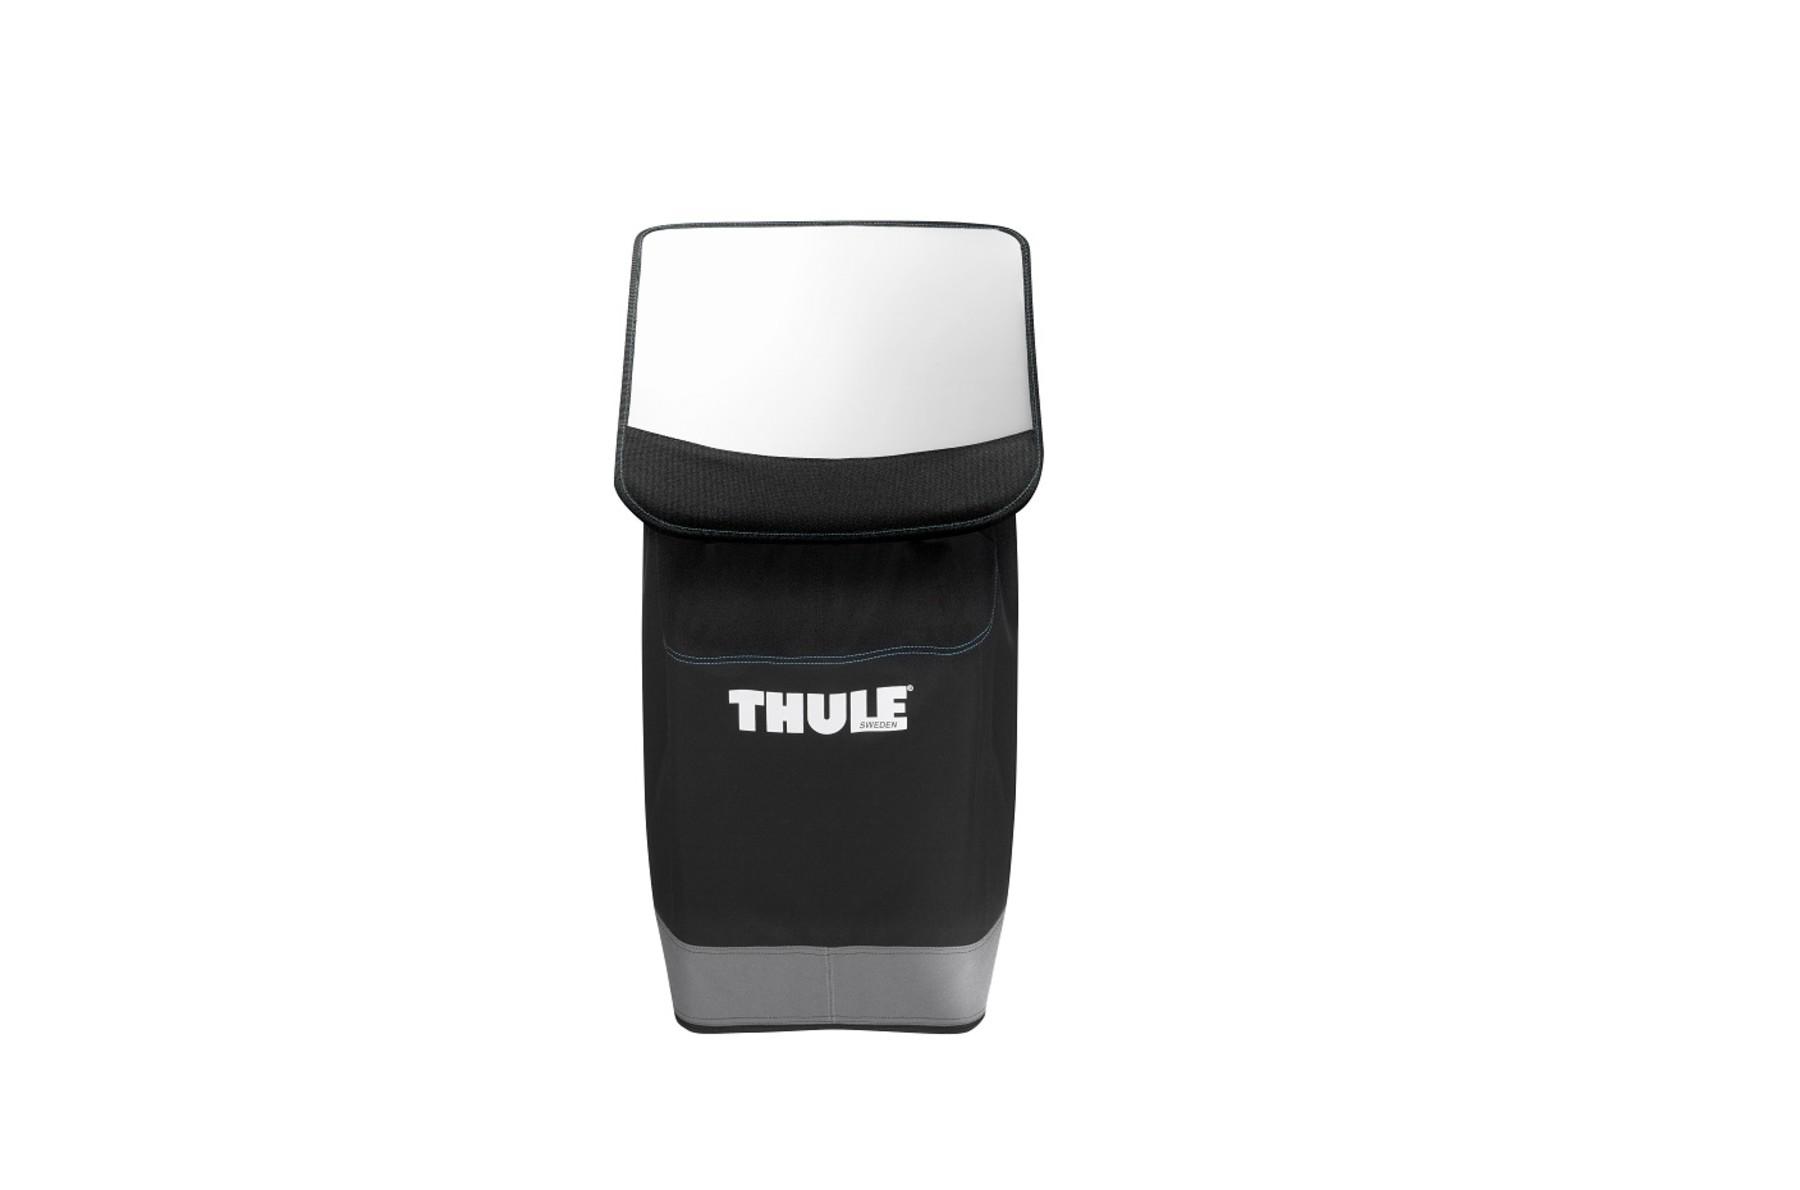 Thule Thrash Bin